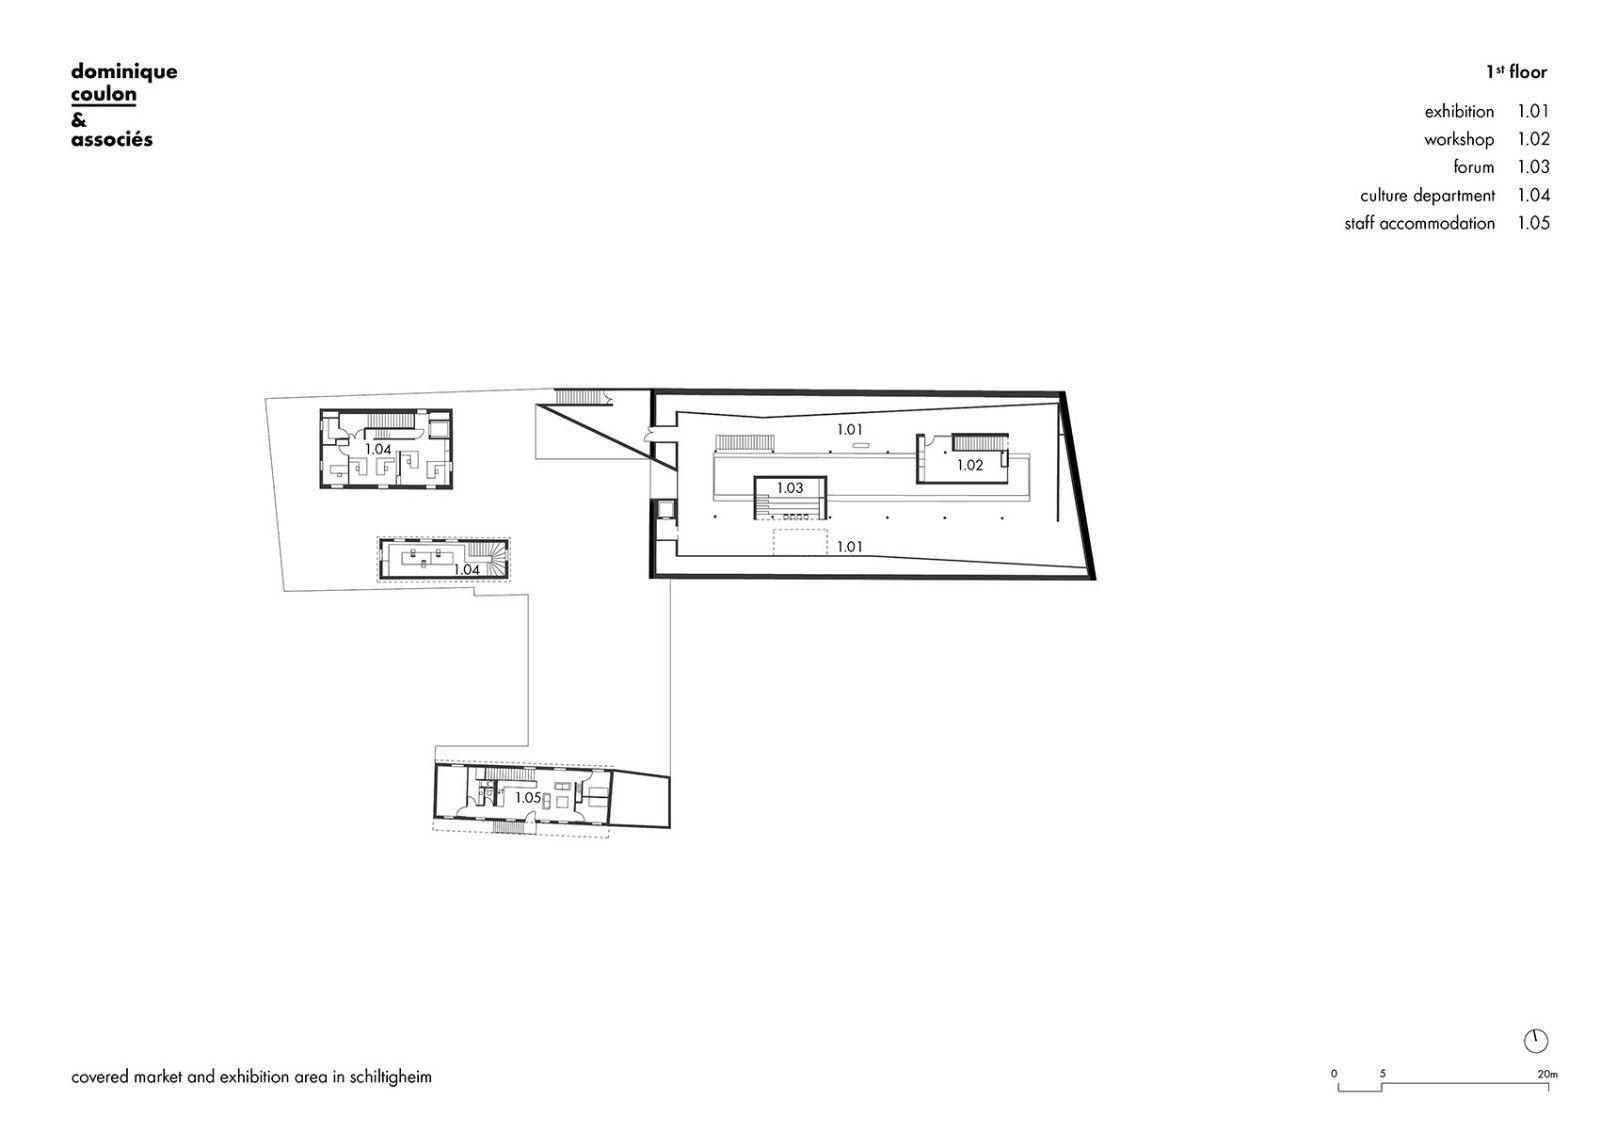 Schiltigheim室内集市和展览空间,法国 / Dominique Coulon & associés